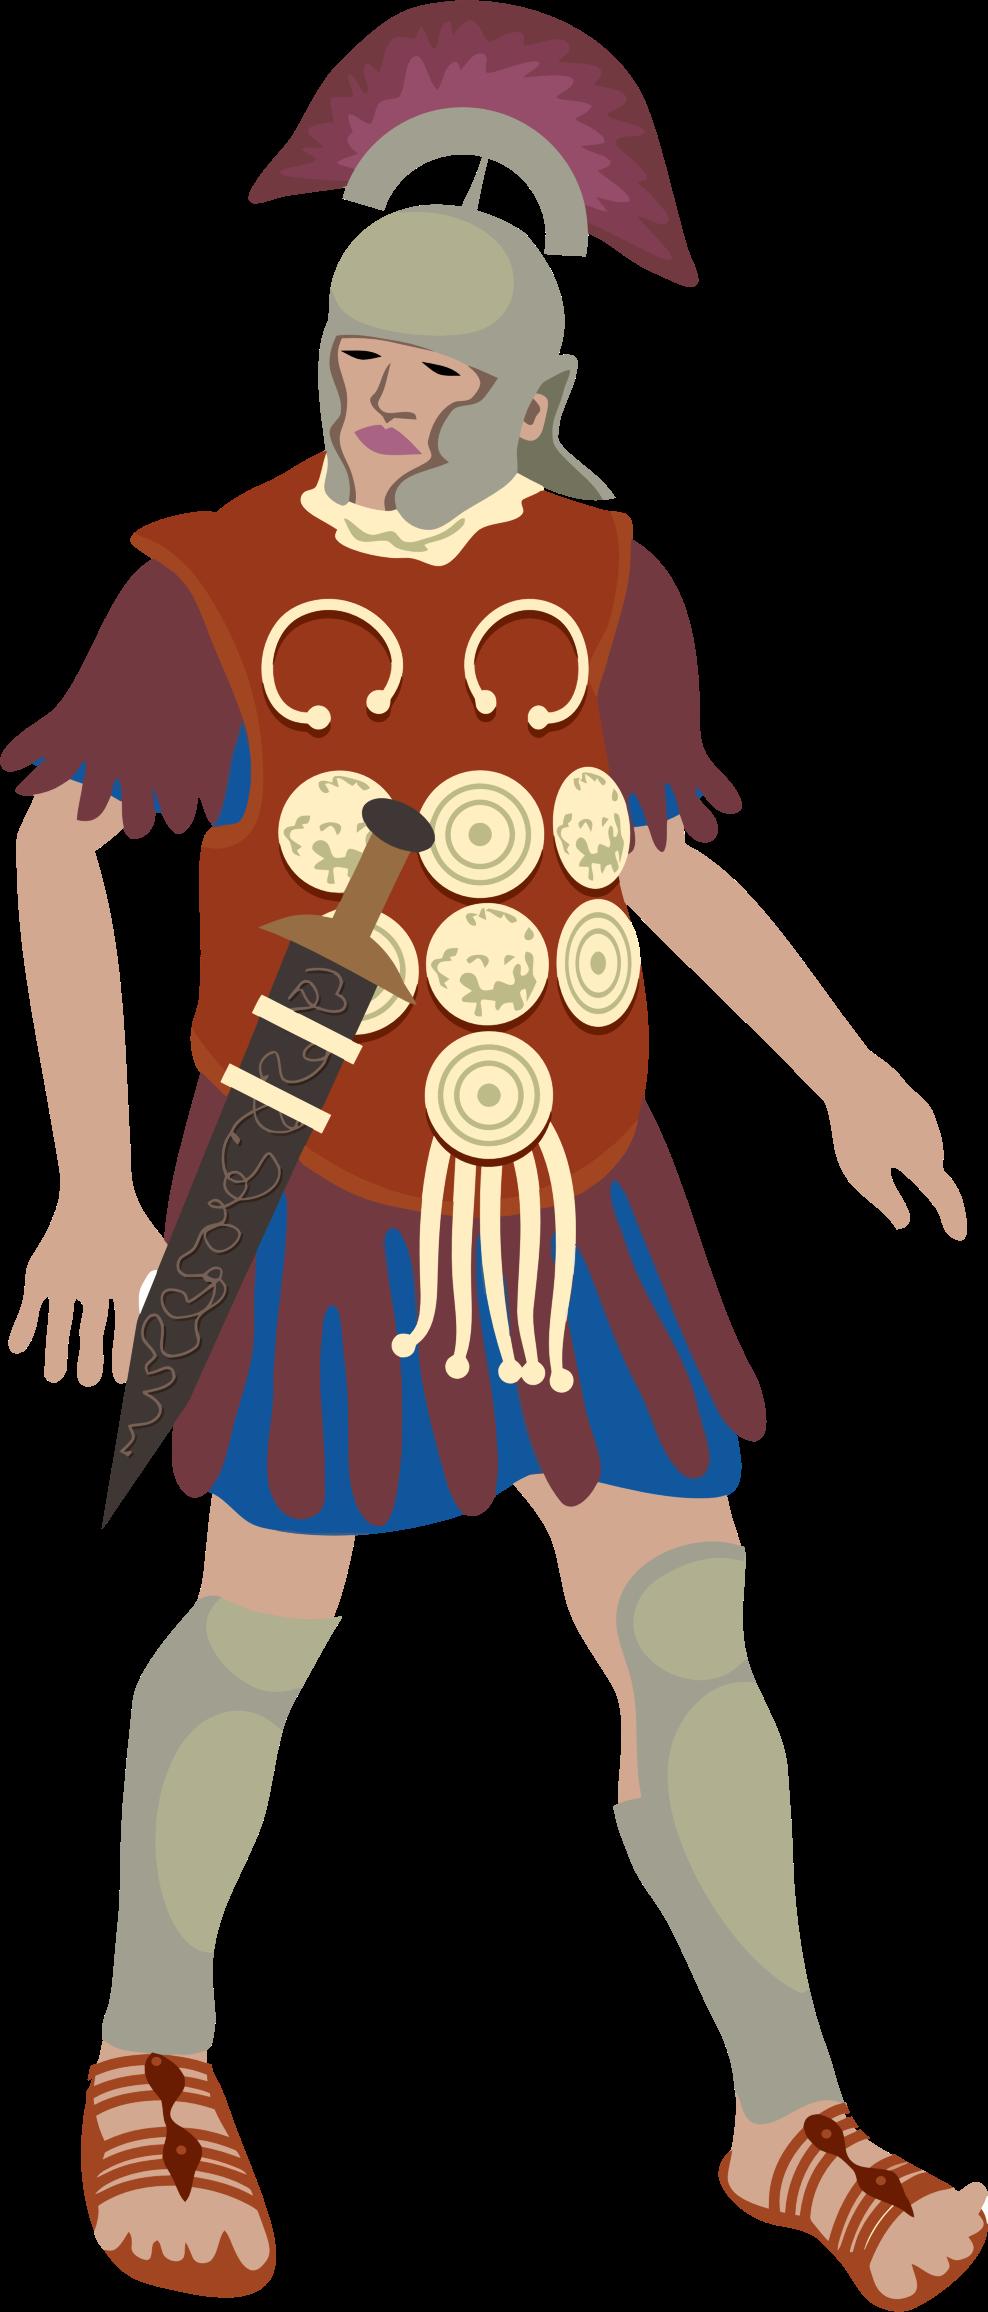 Spartan clipart logo spartan. Roman centurion big image